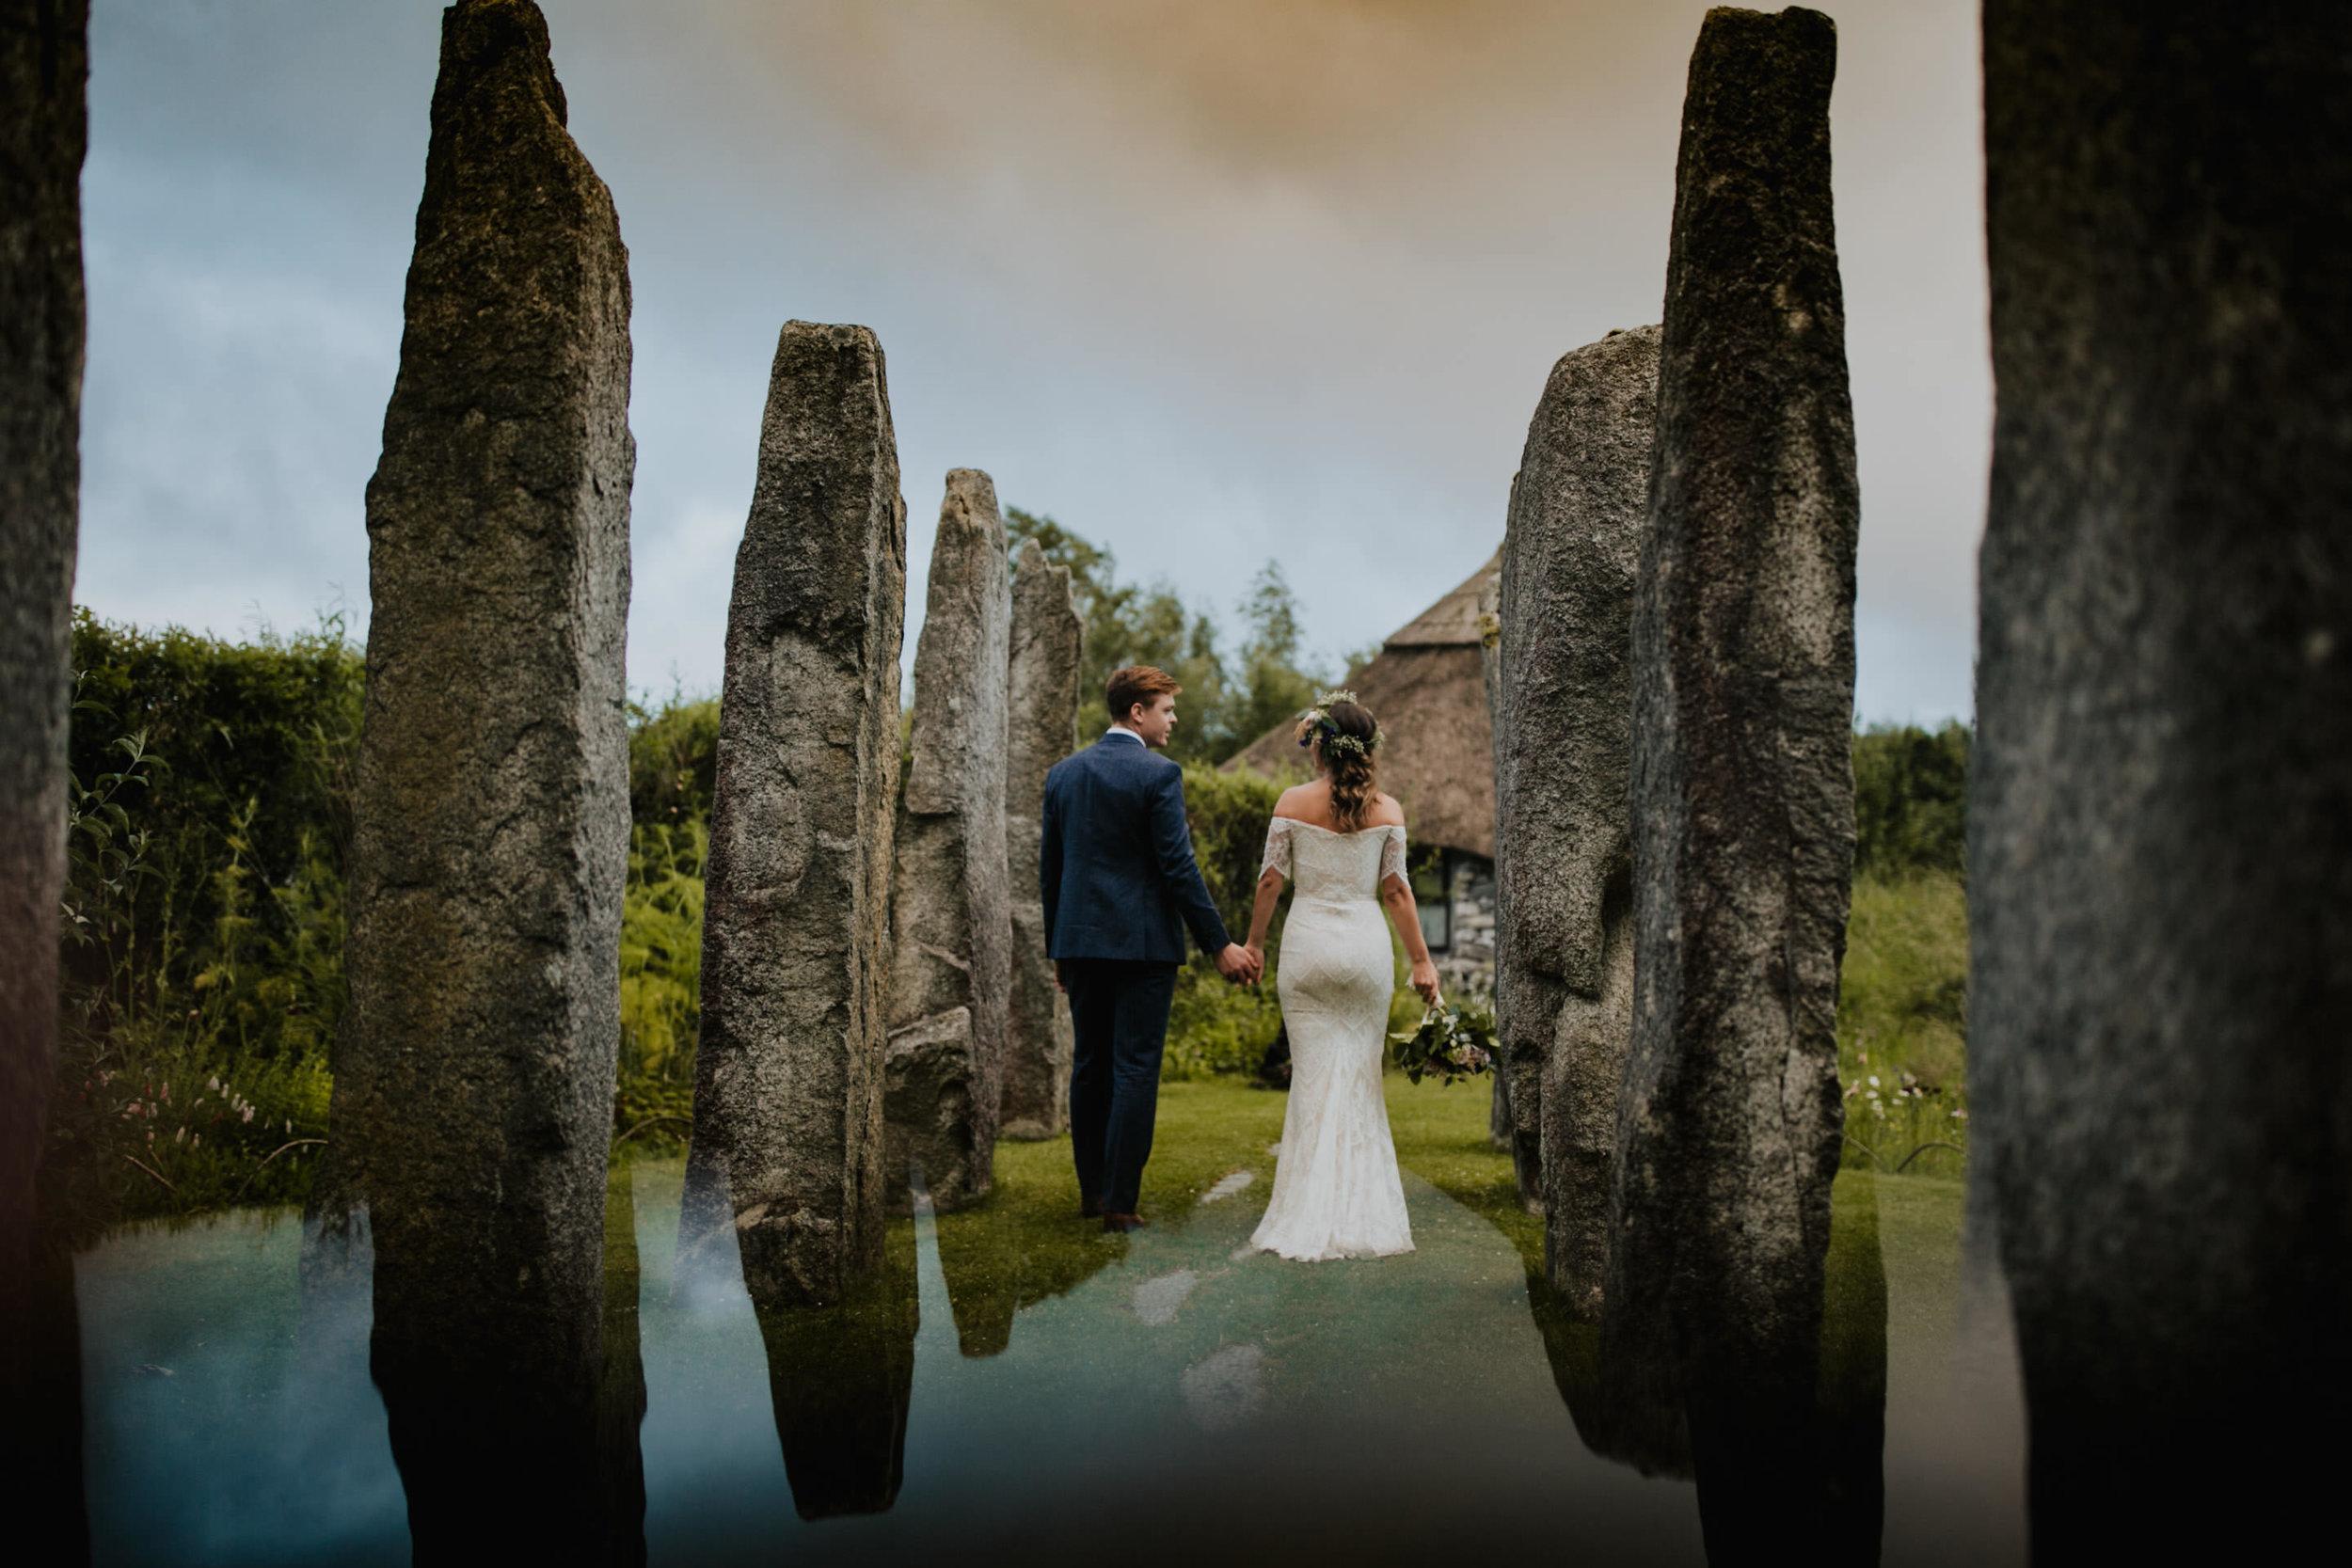 c&j_brigits_garden_galway_wedding_photographer_livia_figueiredo_38.jpg